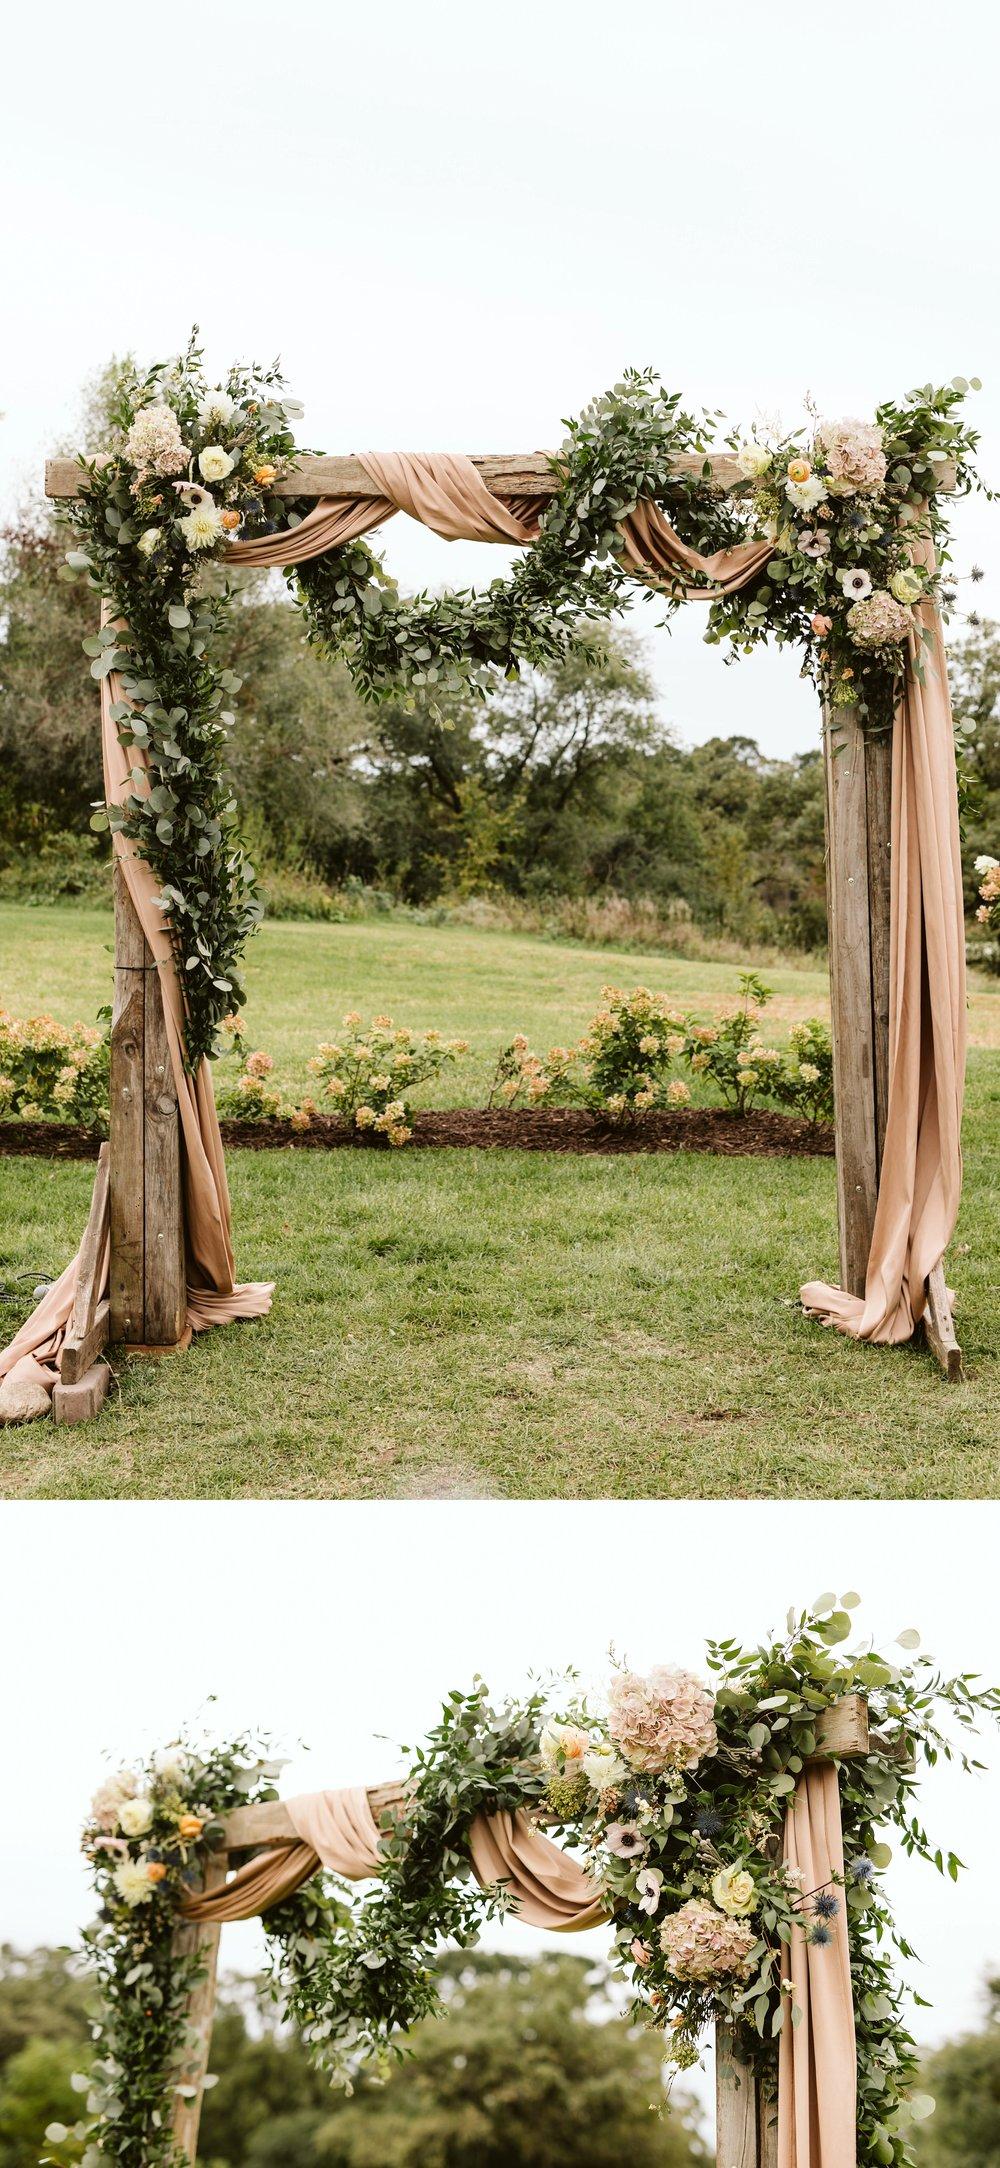 john-p-furber-farm-wedding-in-september-blush-and-coral-flowers-139.jpg